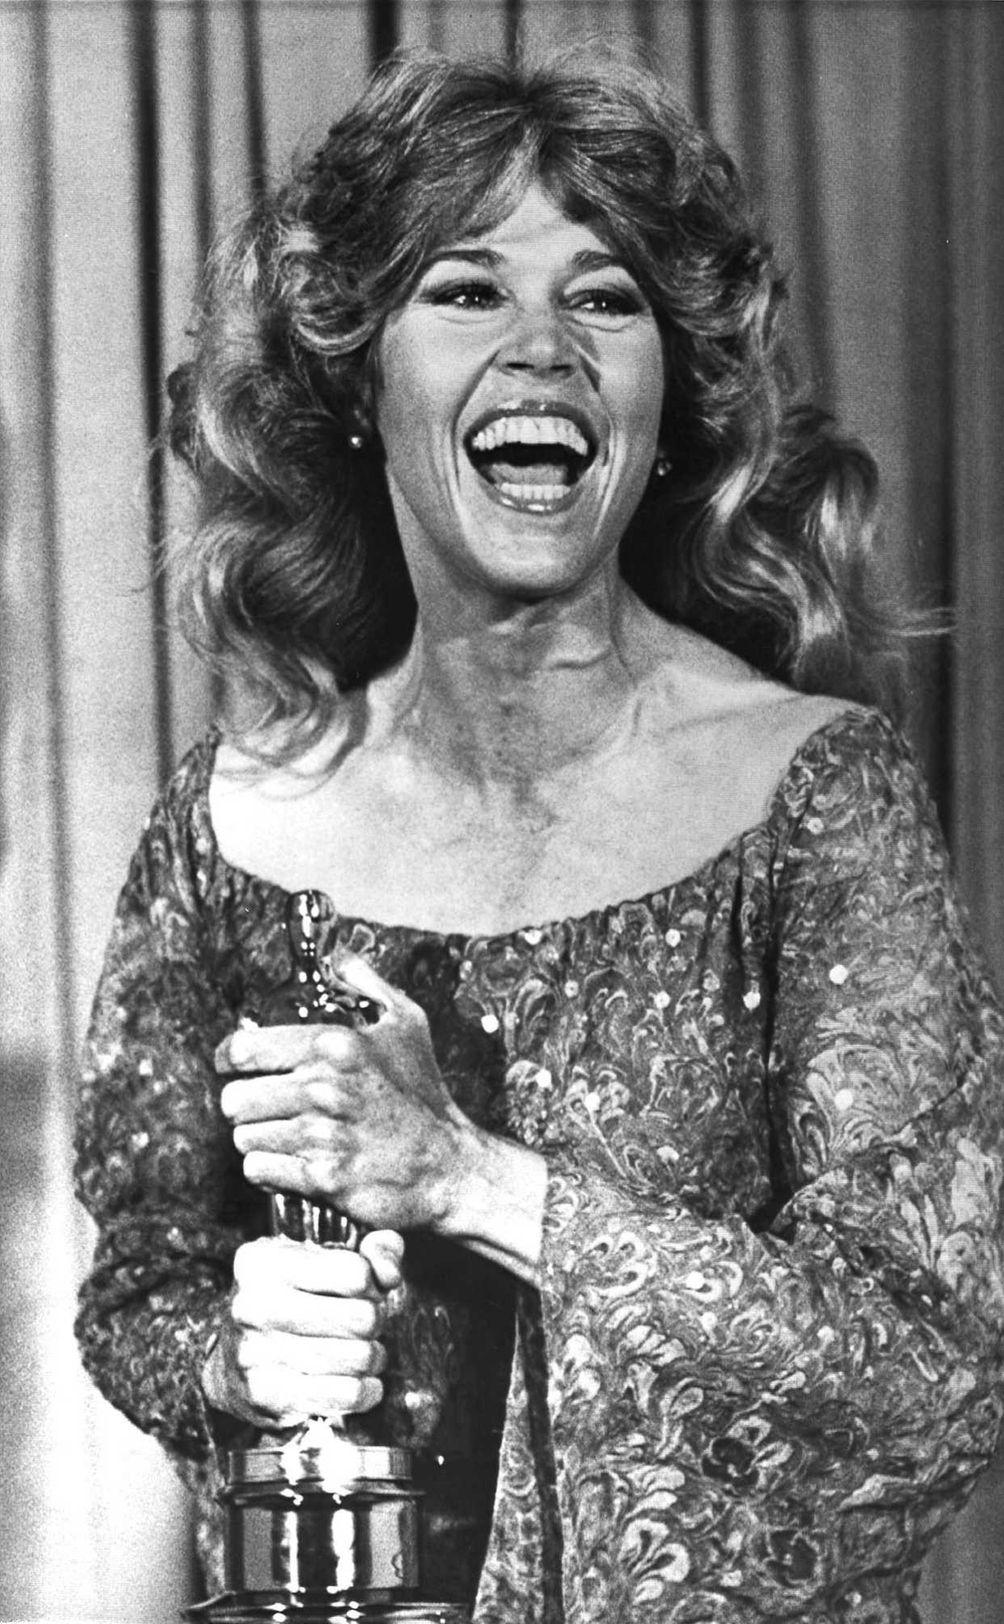 Actor Jane Fonda, holding the Oscar statuette she